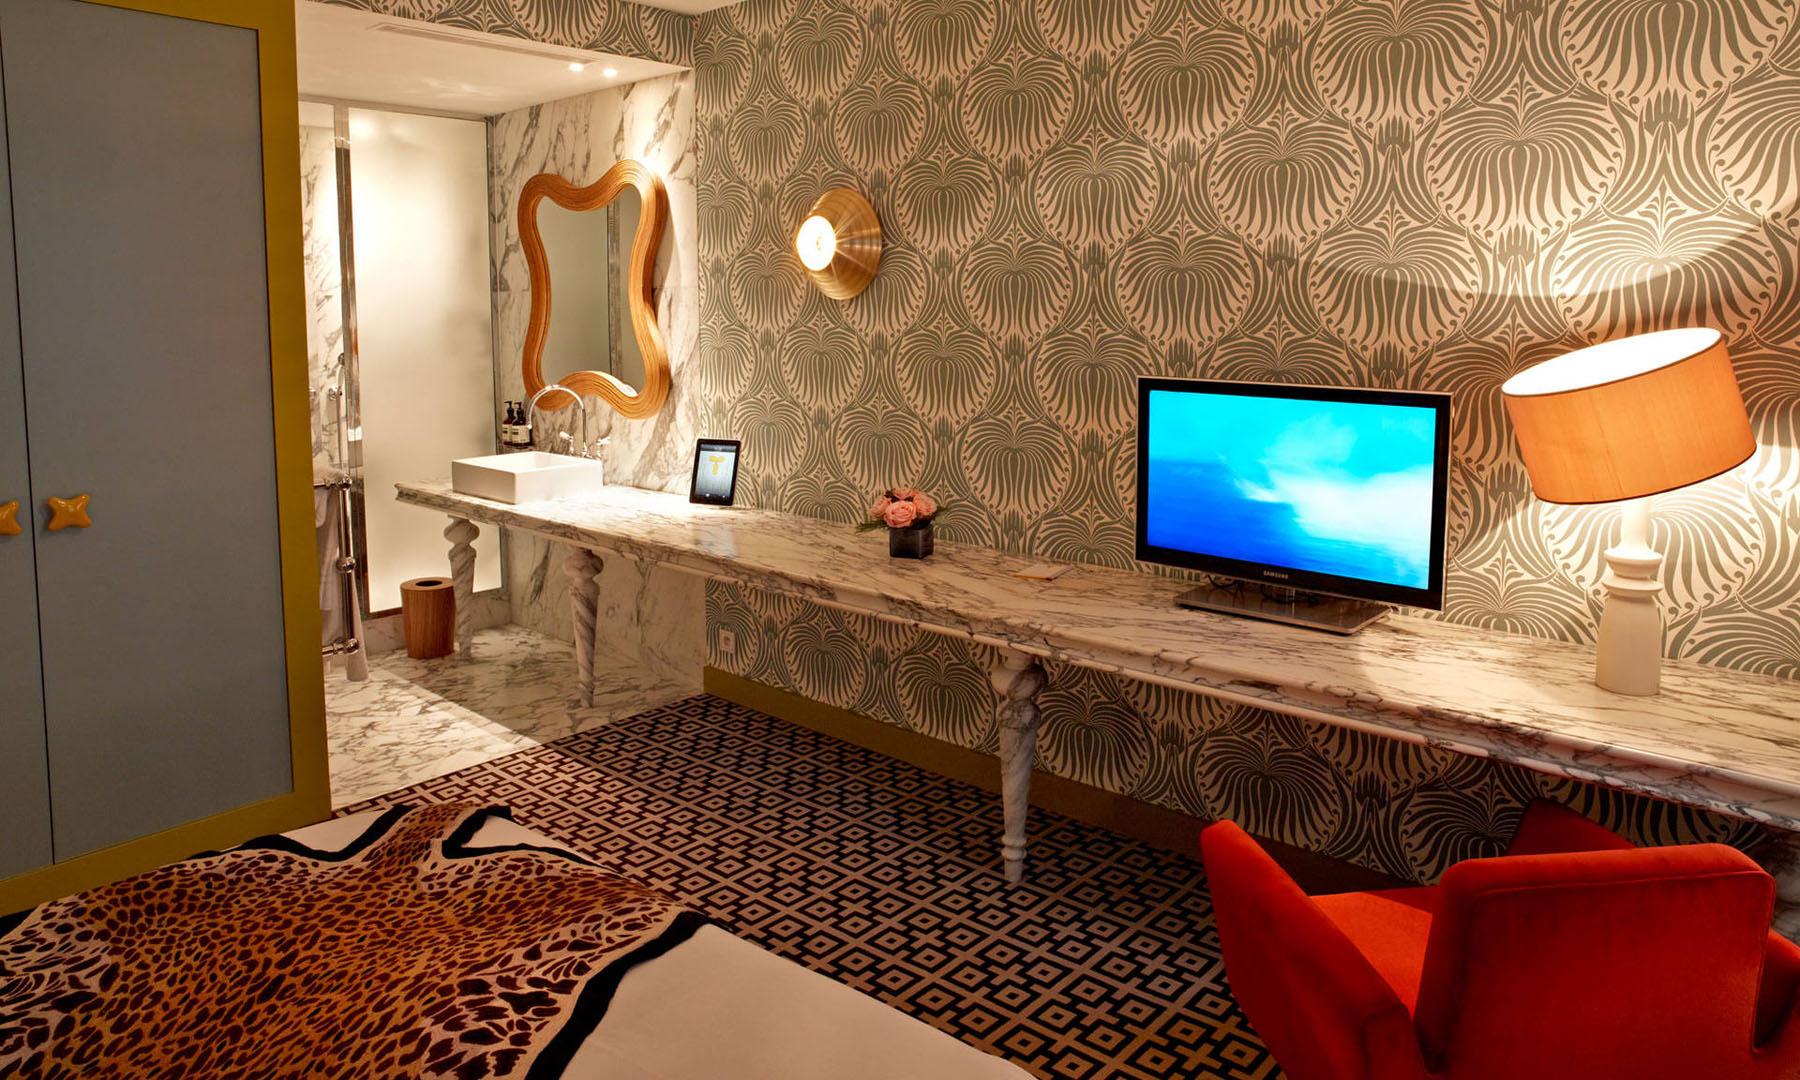 French Art Deco Interior Design By India Mahdavi At Hotel